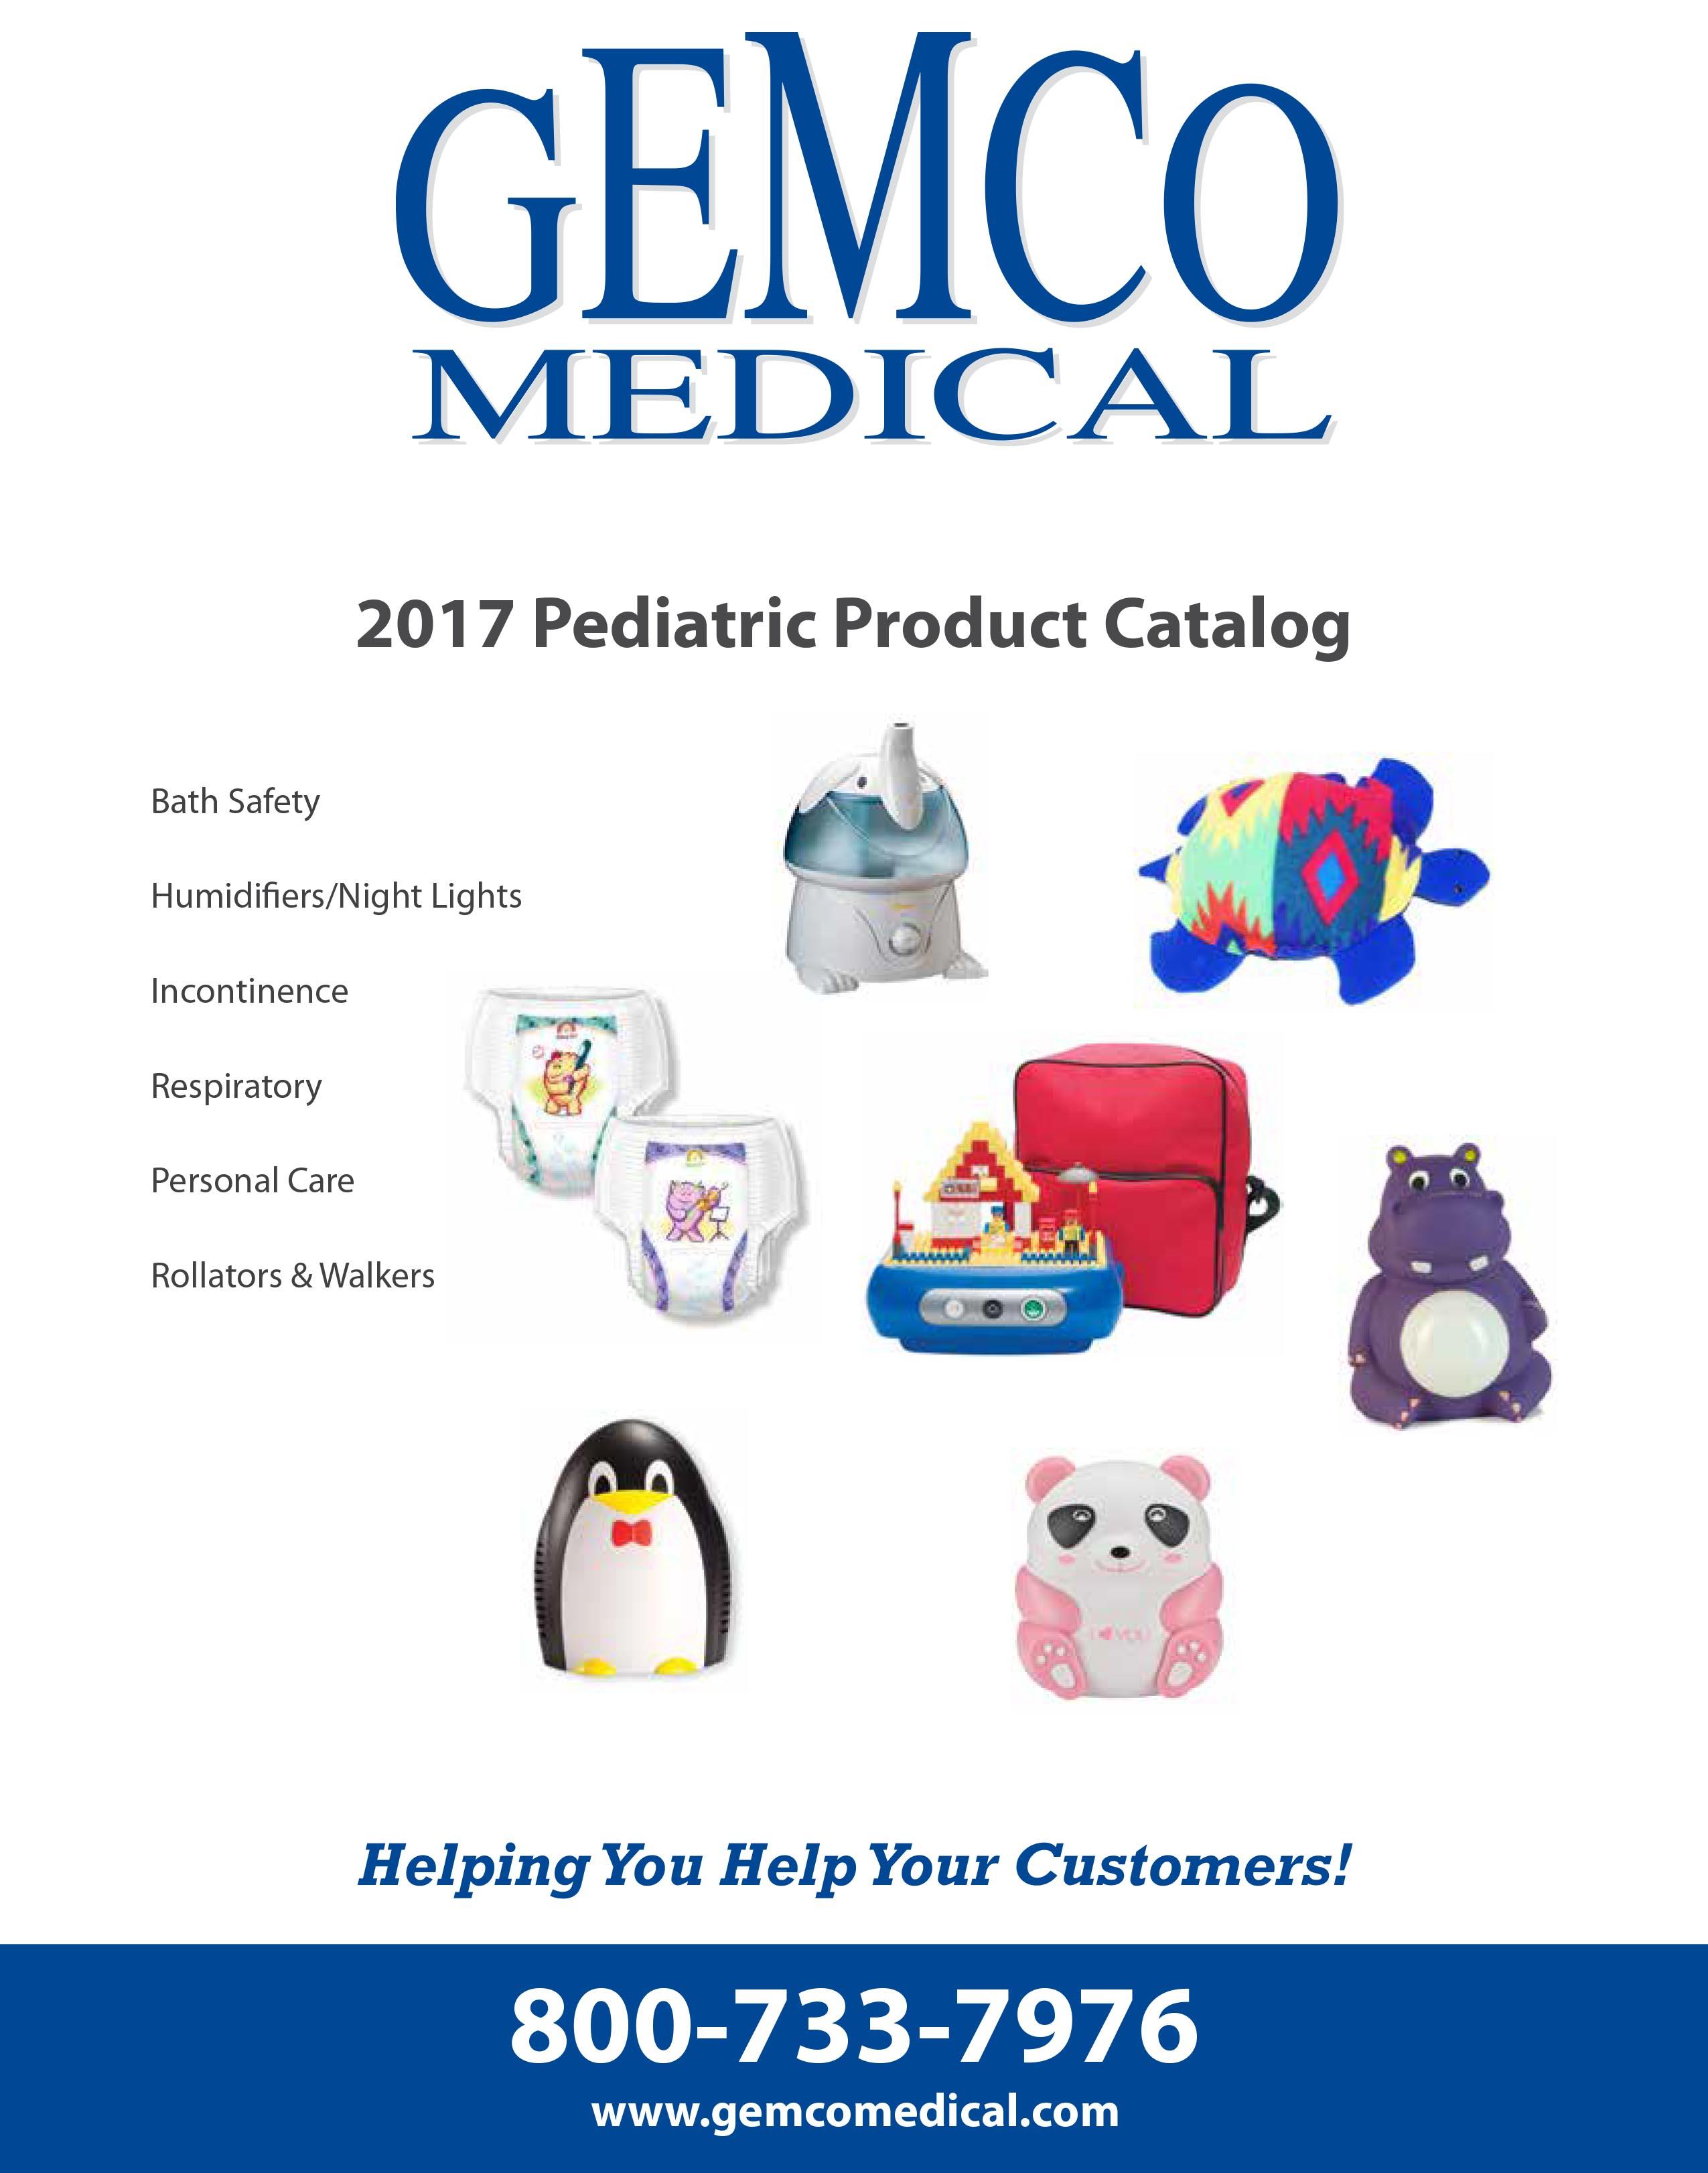 GEMCO Medical | Healthcare distributor